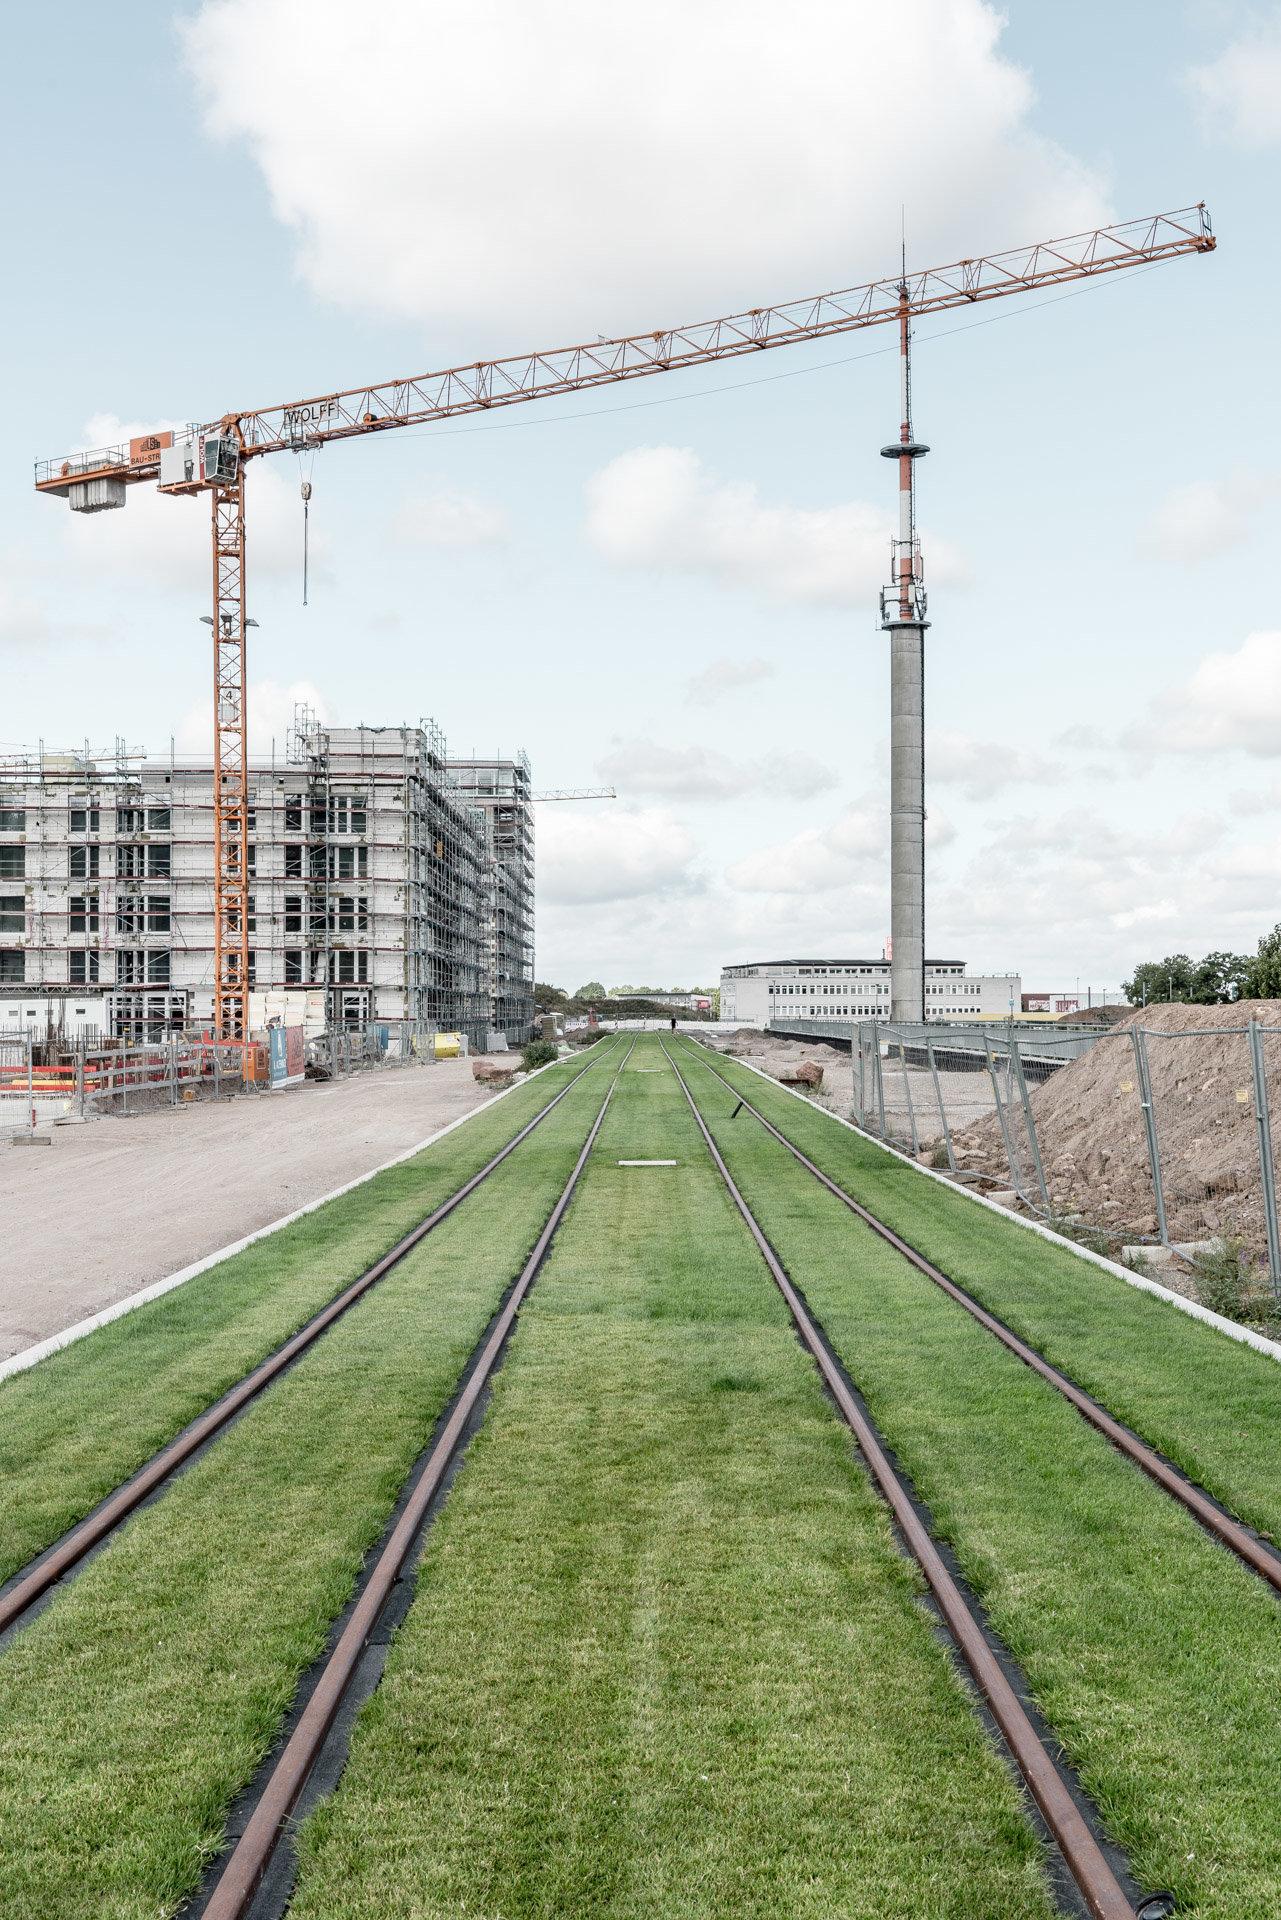 Bahnstadt_10-09-2017-3.jpg